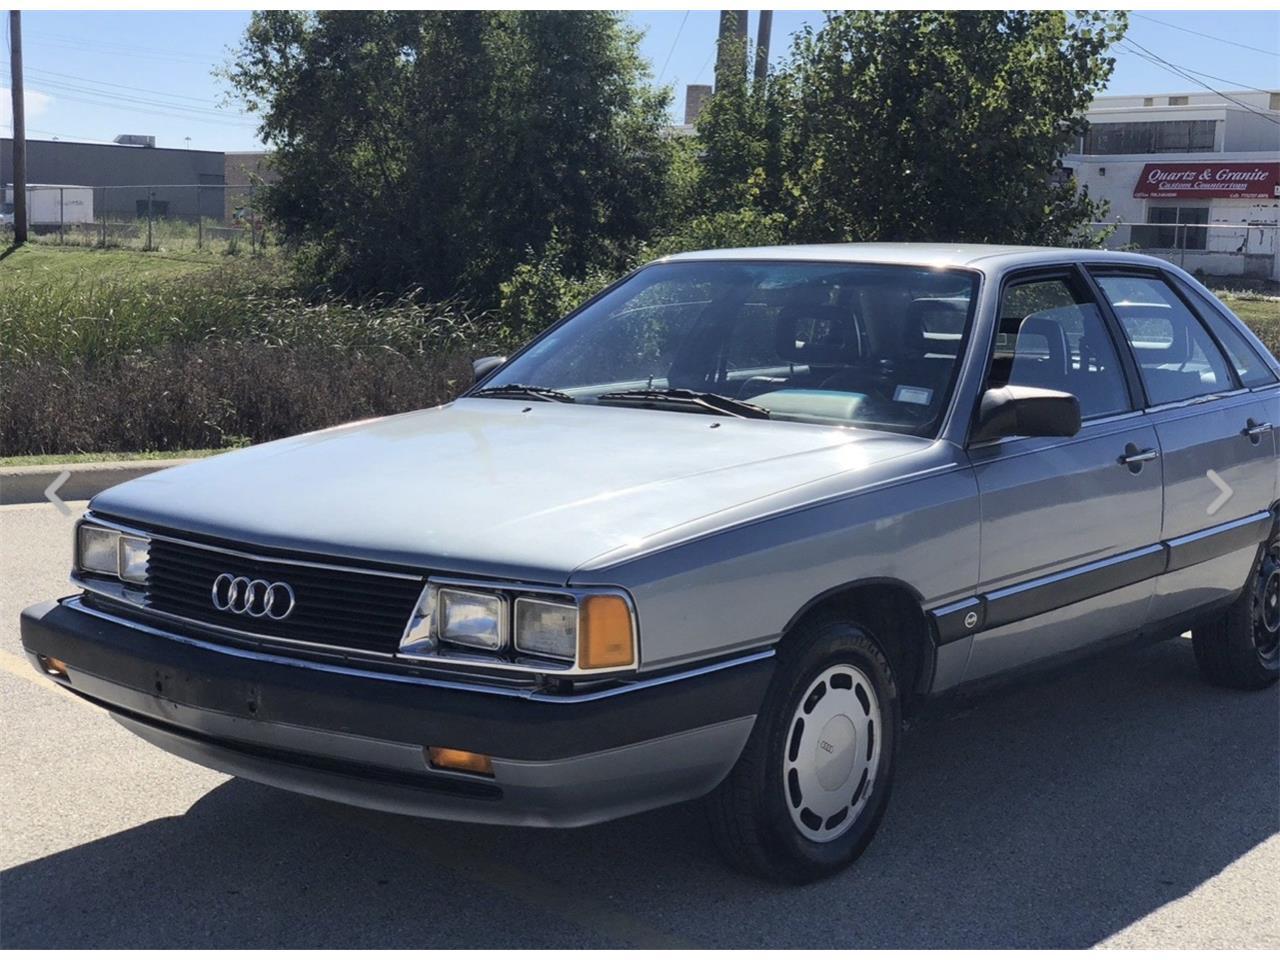 Kokomo Car Dealers >> 1985 Audi 5000 for Sale | ClassicCars.com | CC-1157363